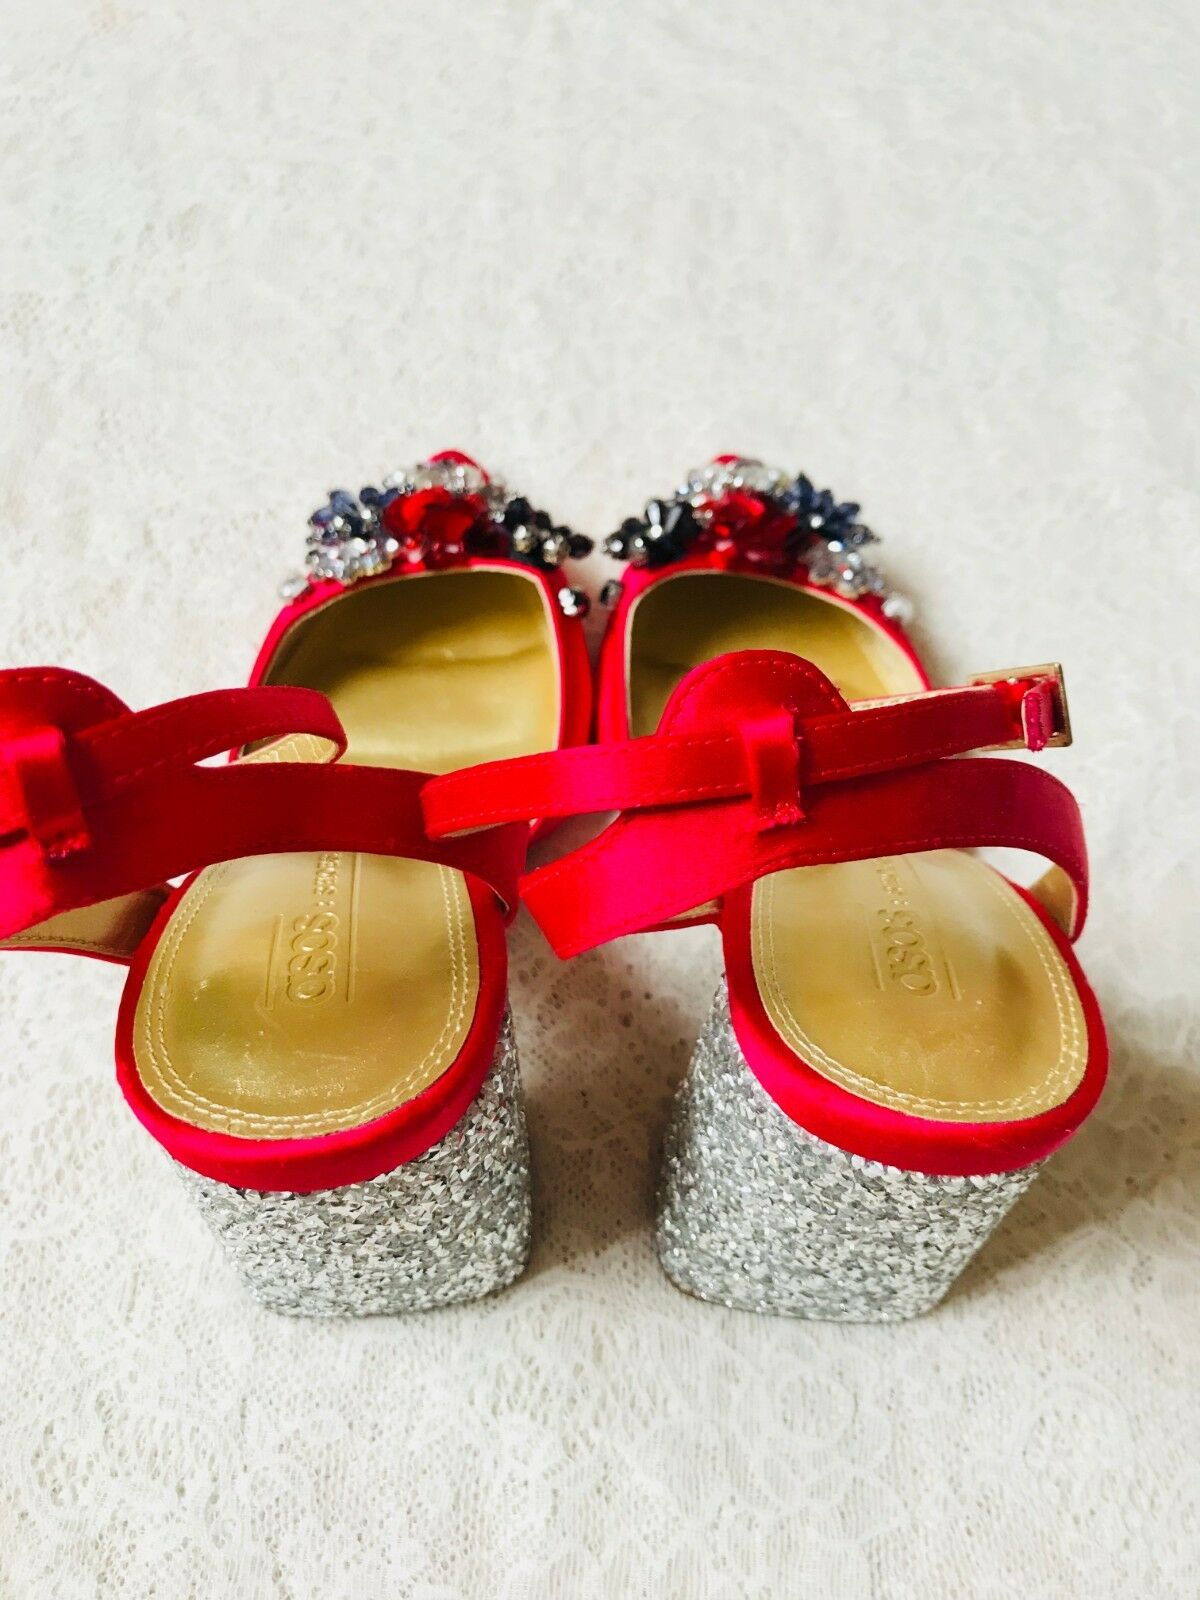 En Bottes Rouge Cuir Chaussures Soldes Bois Talons 40 Valentino qwzZPE